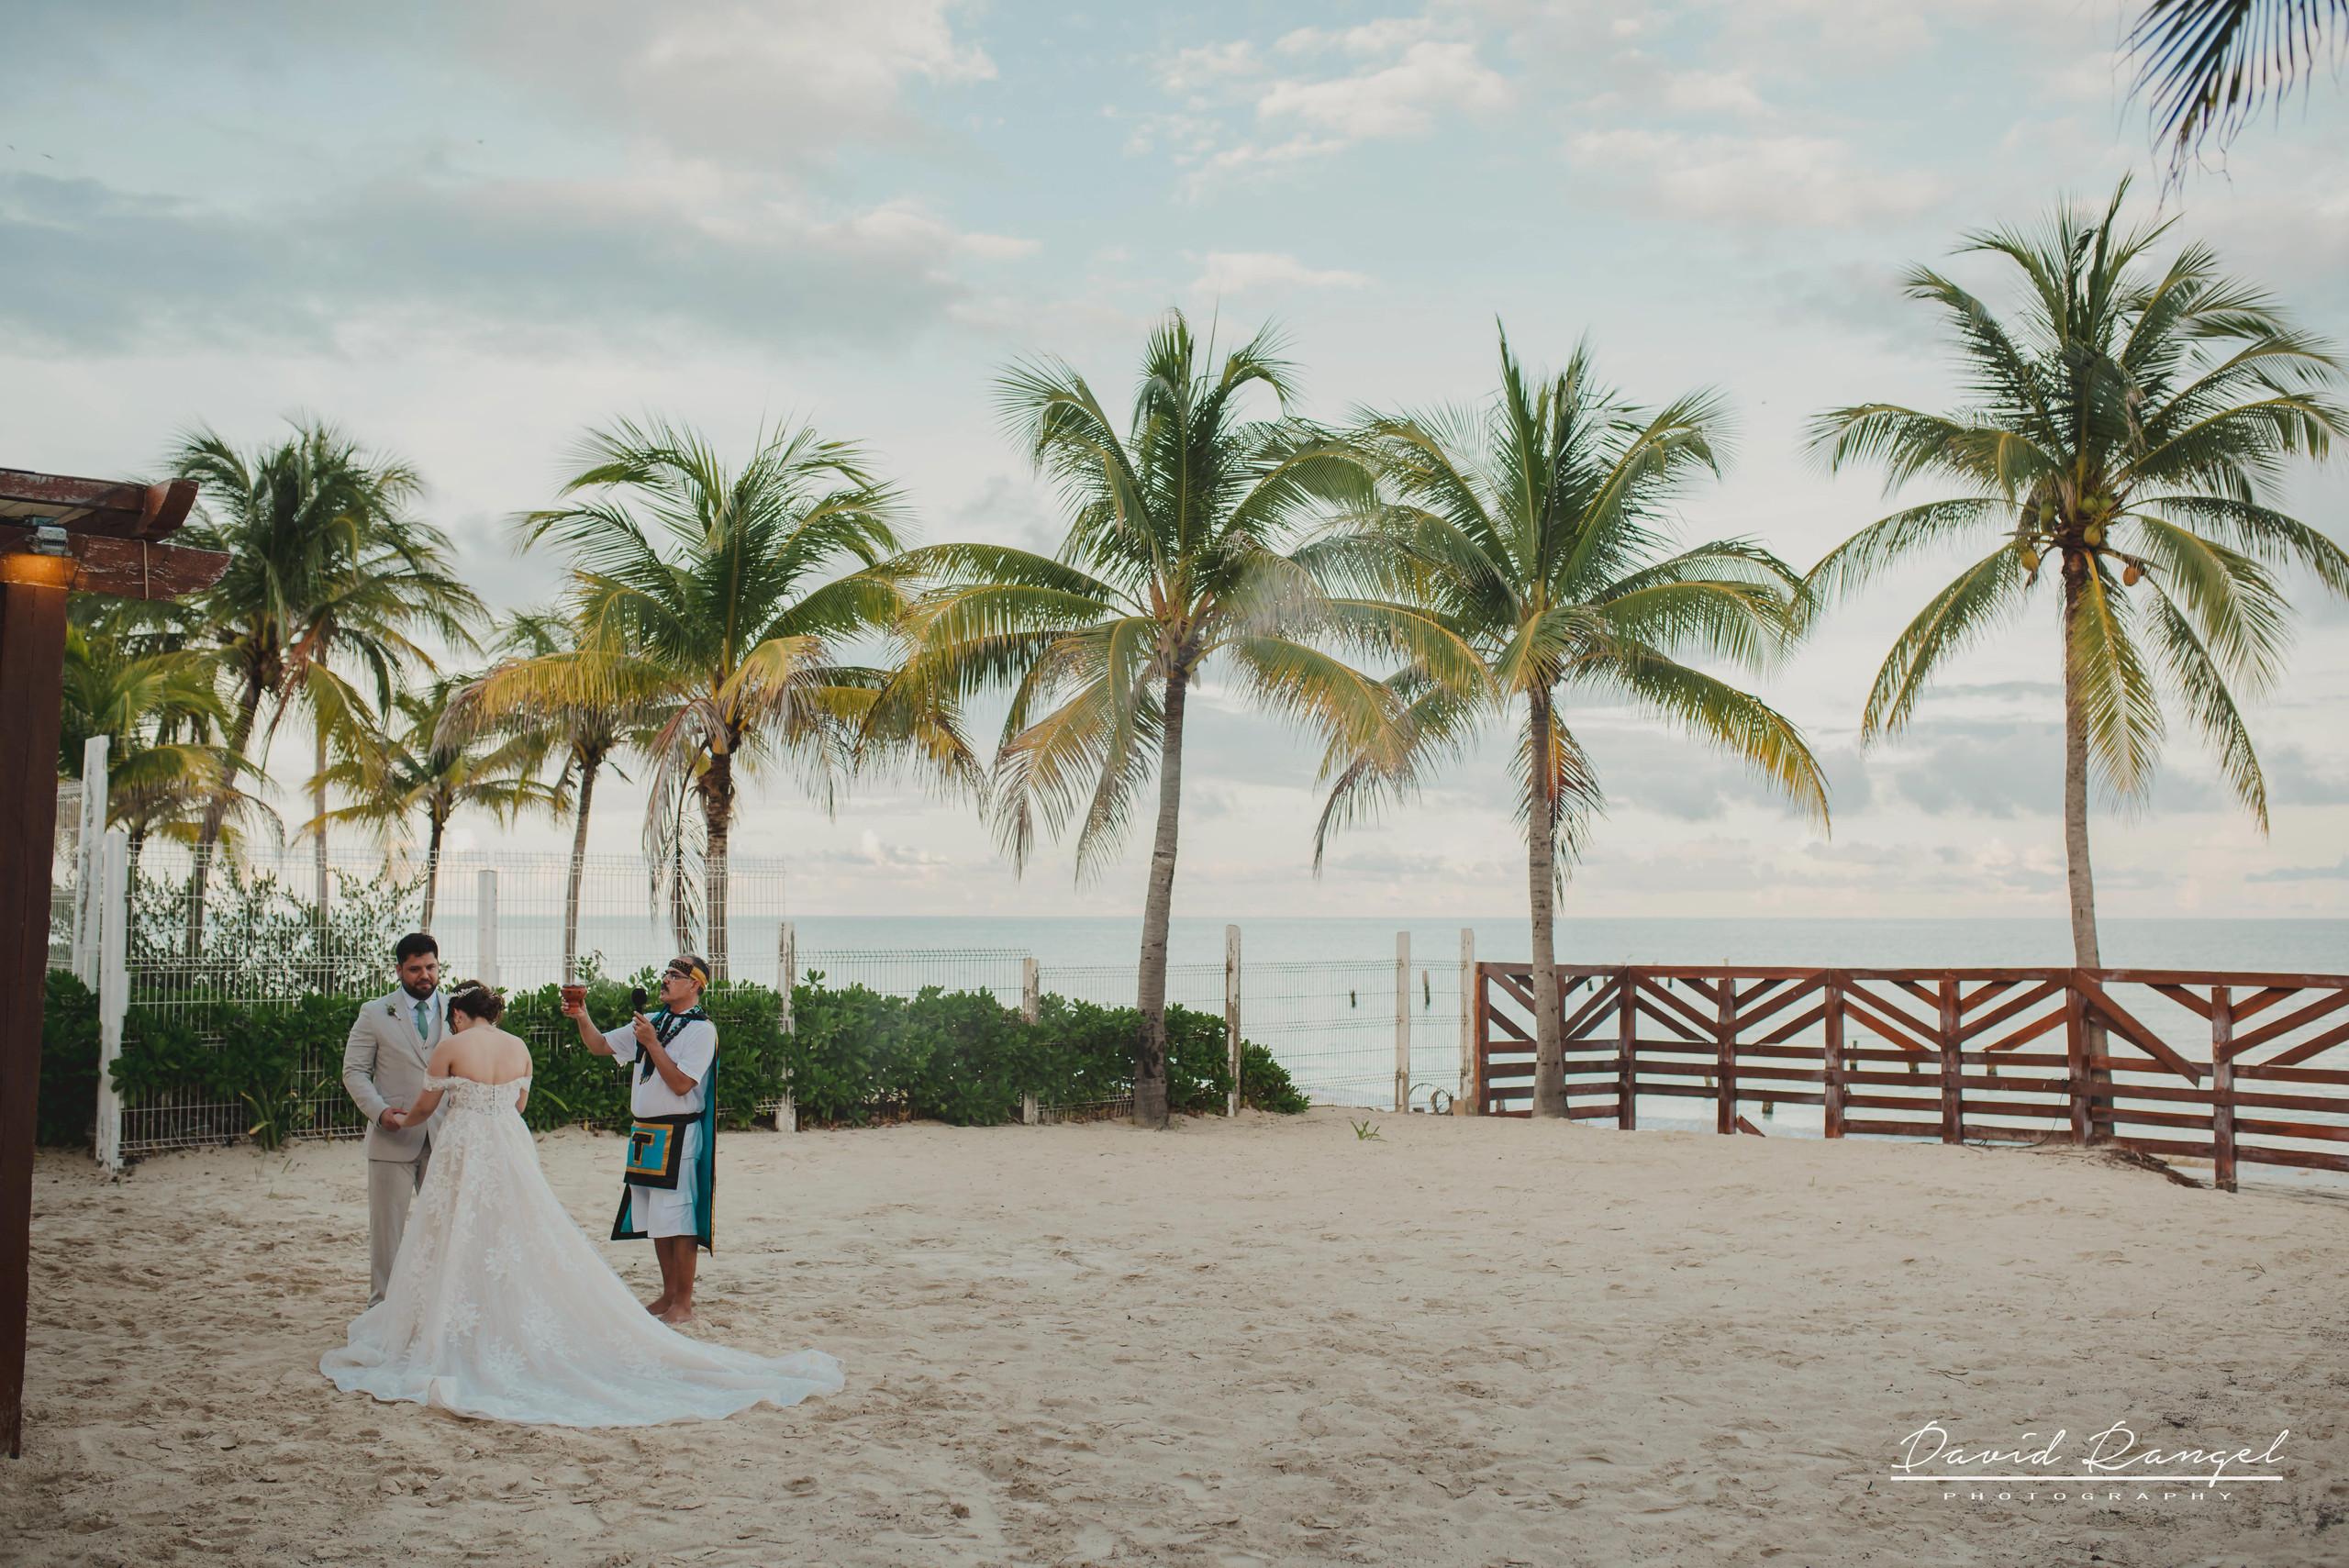 groom+bride+wedding+ceremony+dress+villa+chenera+isla+blanca+costa+mujeres+garden+beach+chaman+traditional+mayan+wedding+panoramic+angular